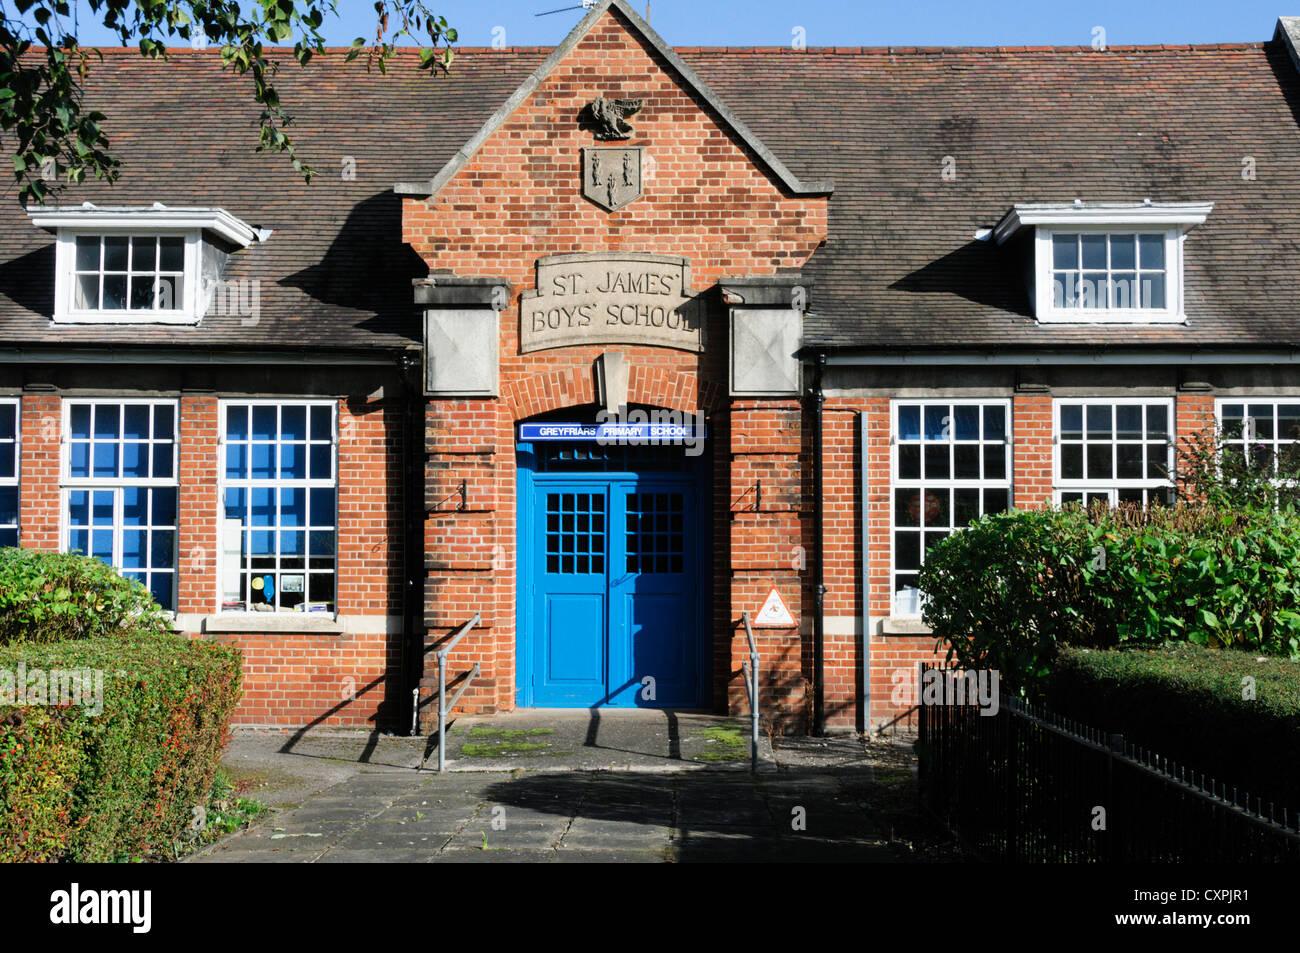 Greyfriars Community Primary School in building of old St James' Boys' School, King's Lynn, Norfolk. - Stock Image